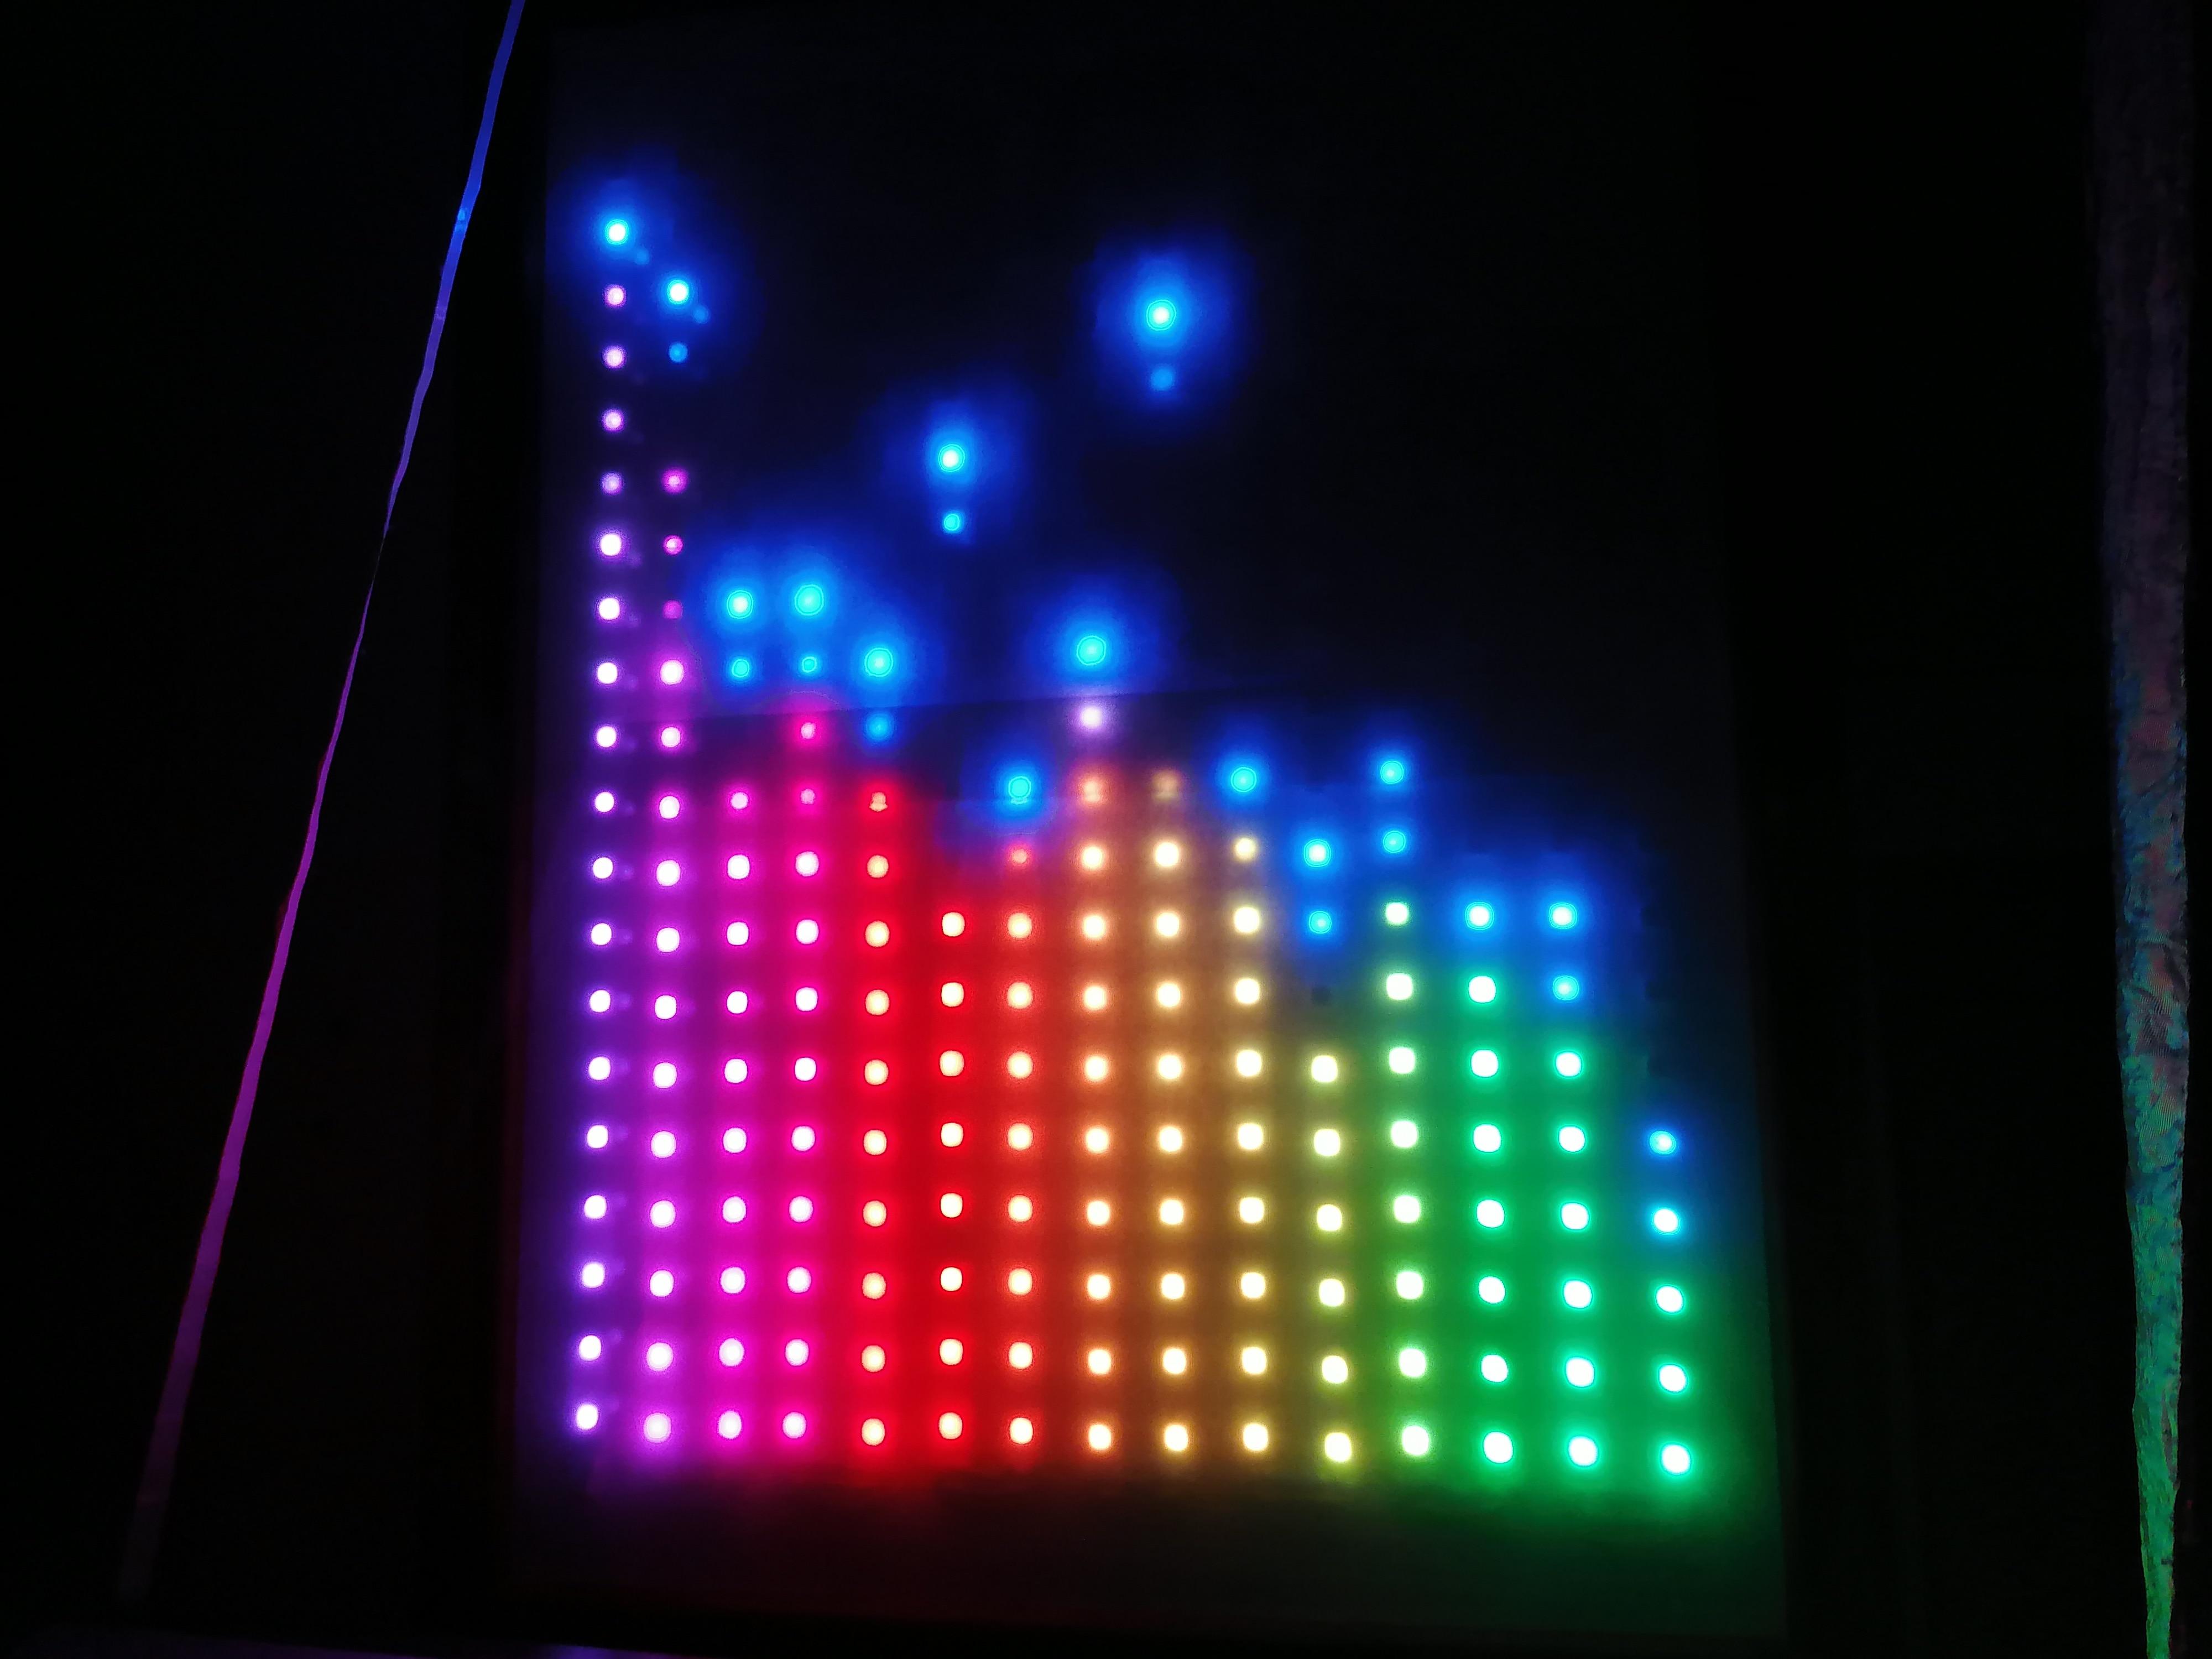 DC5V WS2812B 1m/4m/5m 30/60/74/96/144 pixels/leds/m Smart led pixel strip,Black/White PCB,WS2812 IC;WS2812B/M,IP30/IP65/IP67|smart led pixel strip|pixel stripled pixel strip - AliExpress